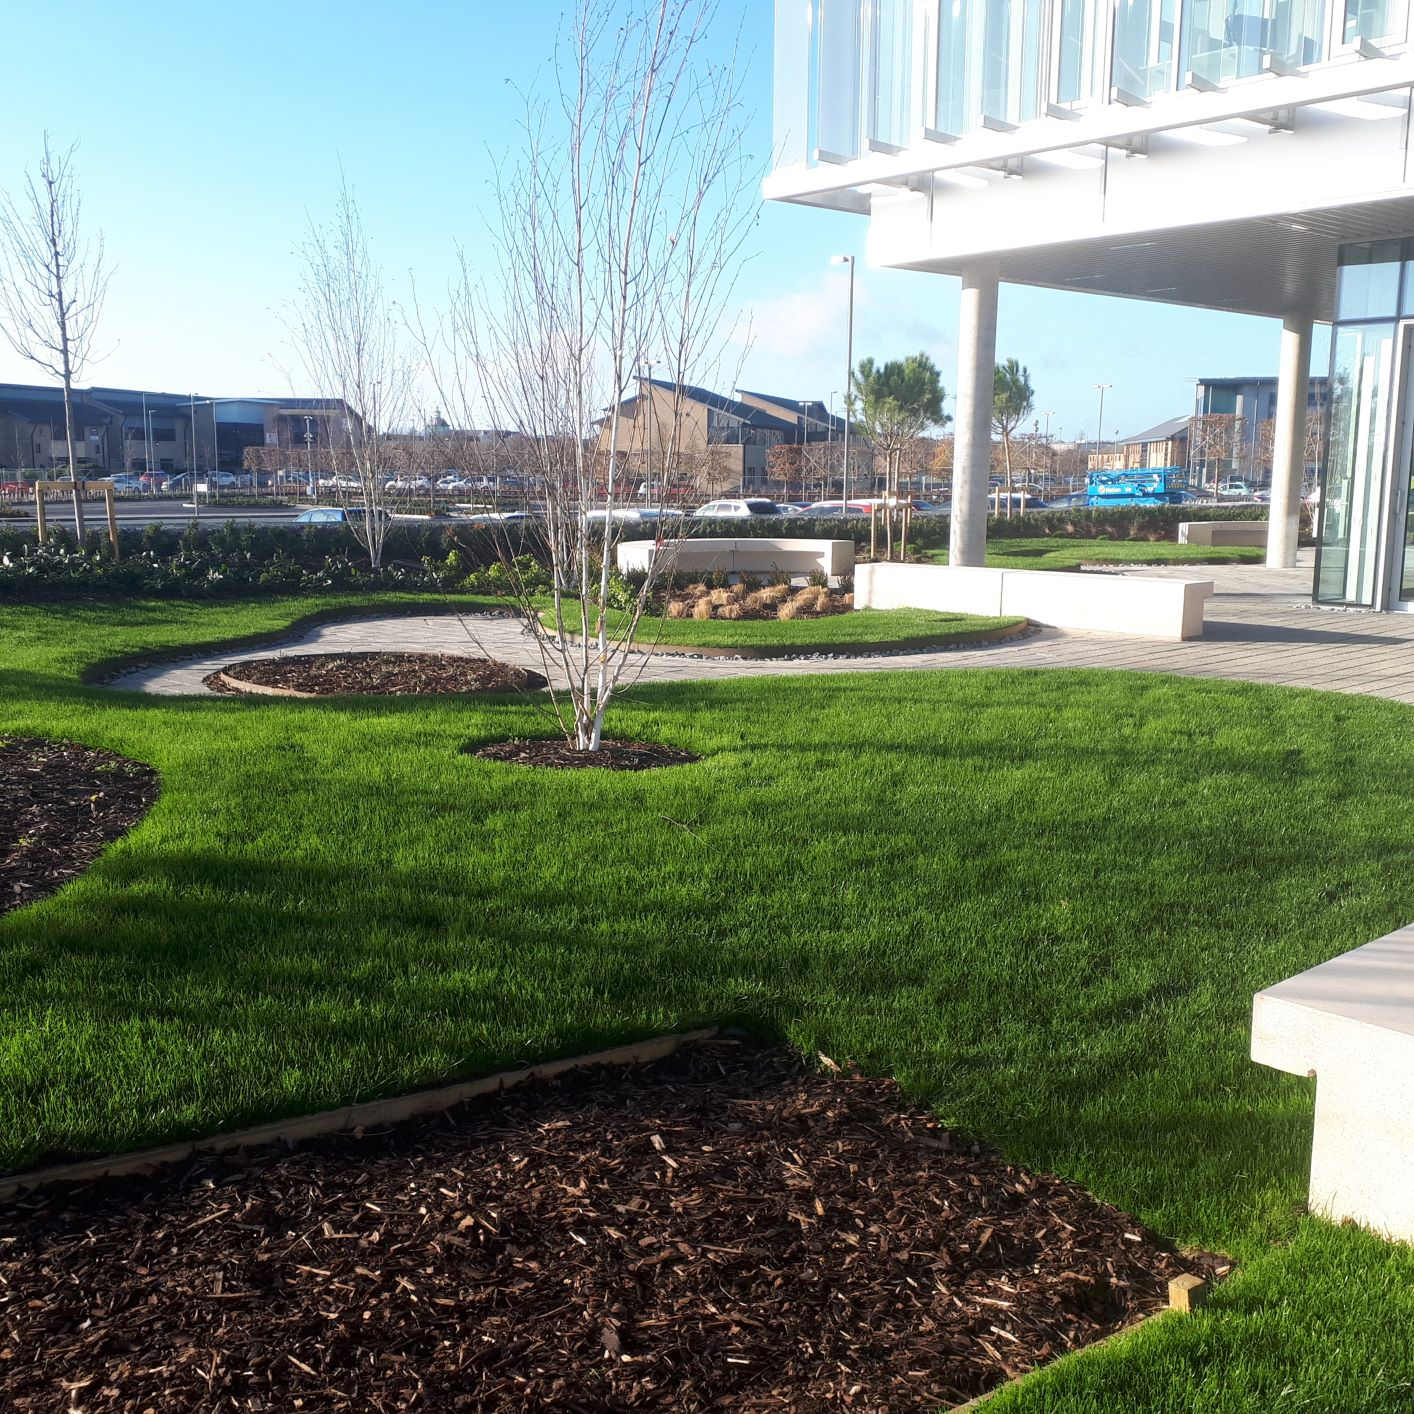 Project Greengrass